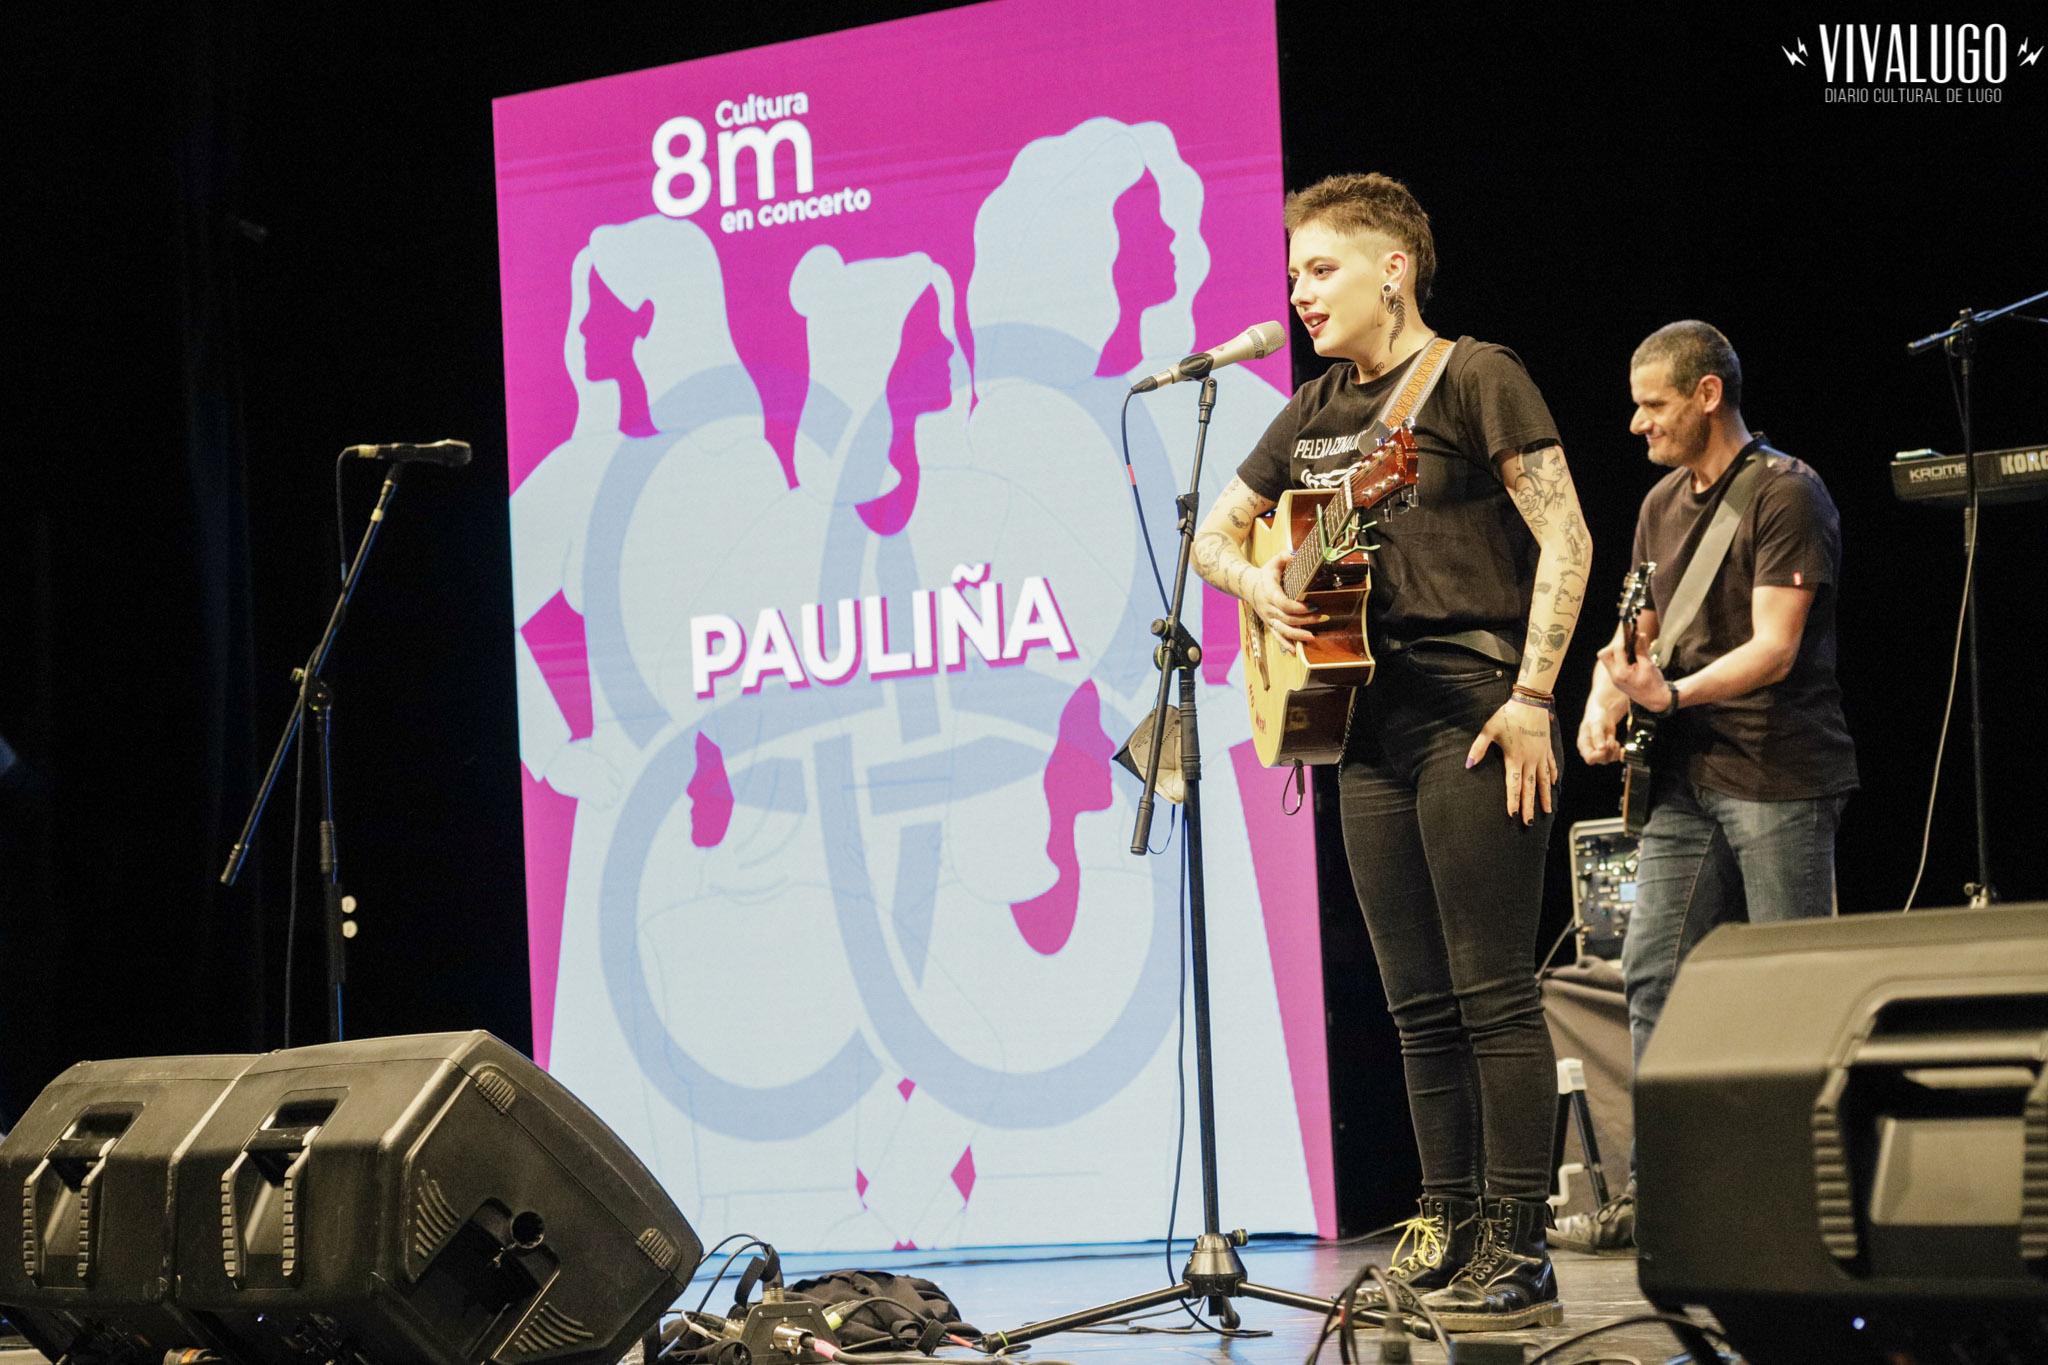 Concertos Lugo 8M. Pauliña e Laura LaMontagne.